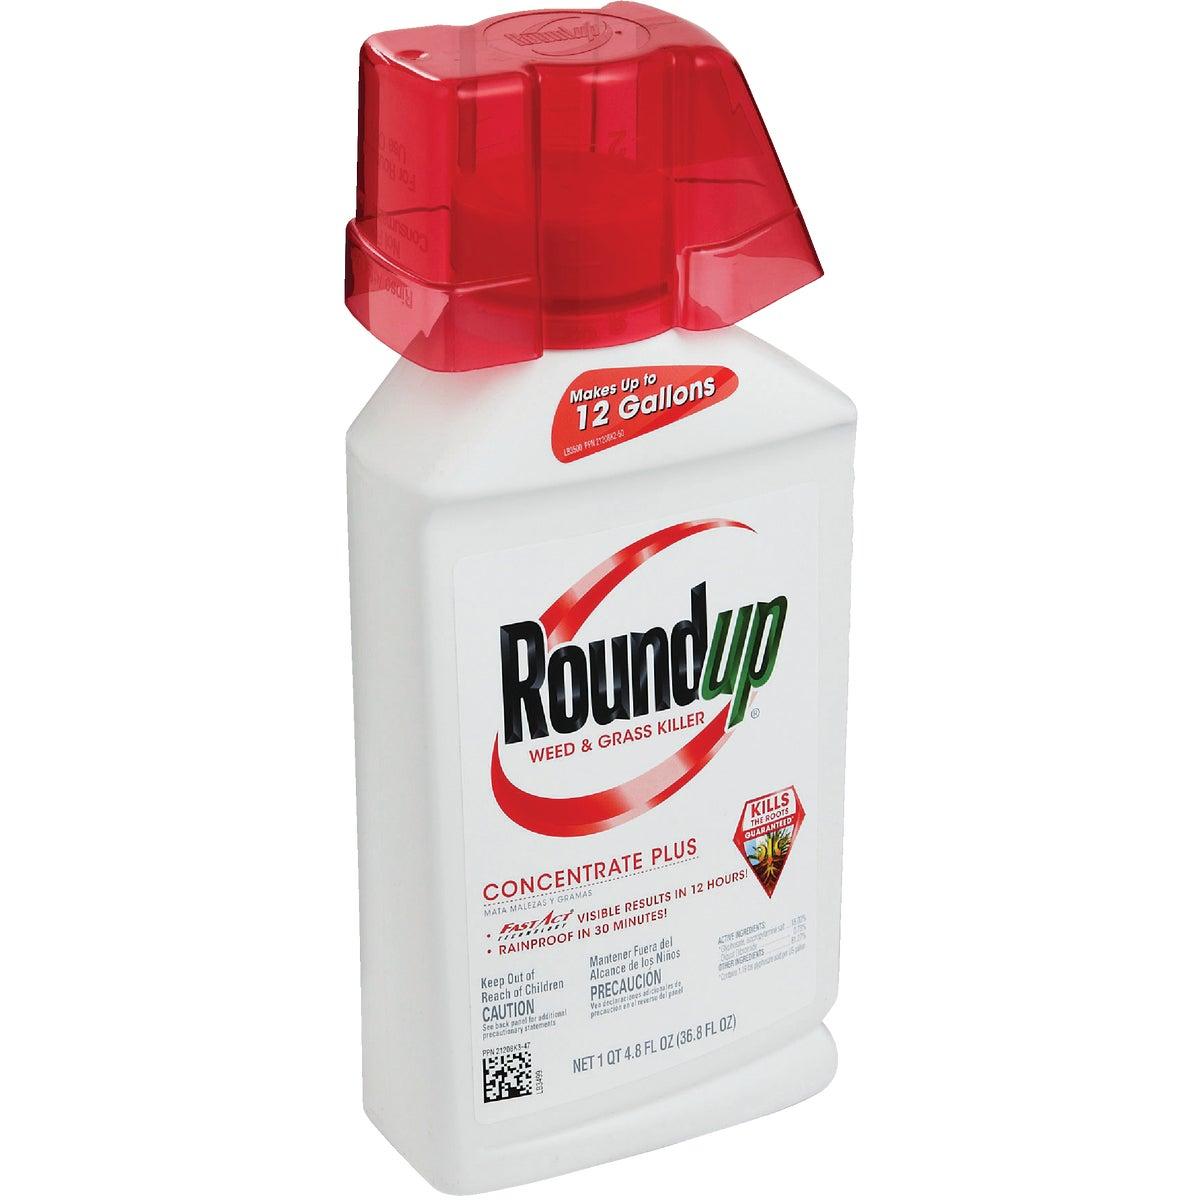 36.8 OZ CONC+ ROUNDUP